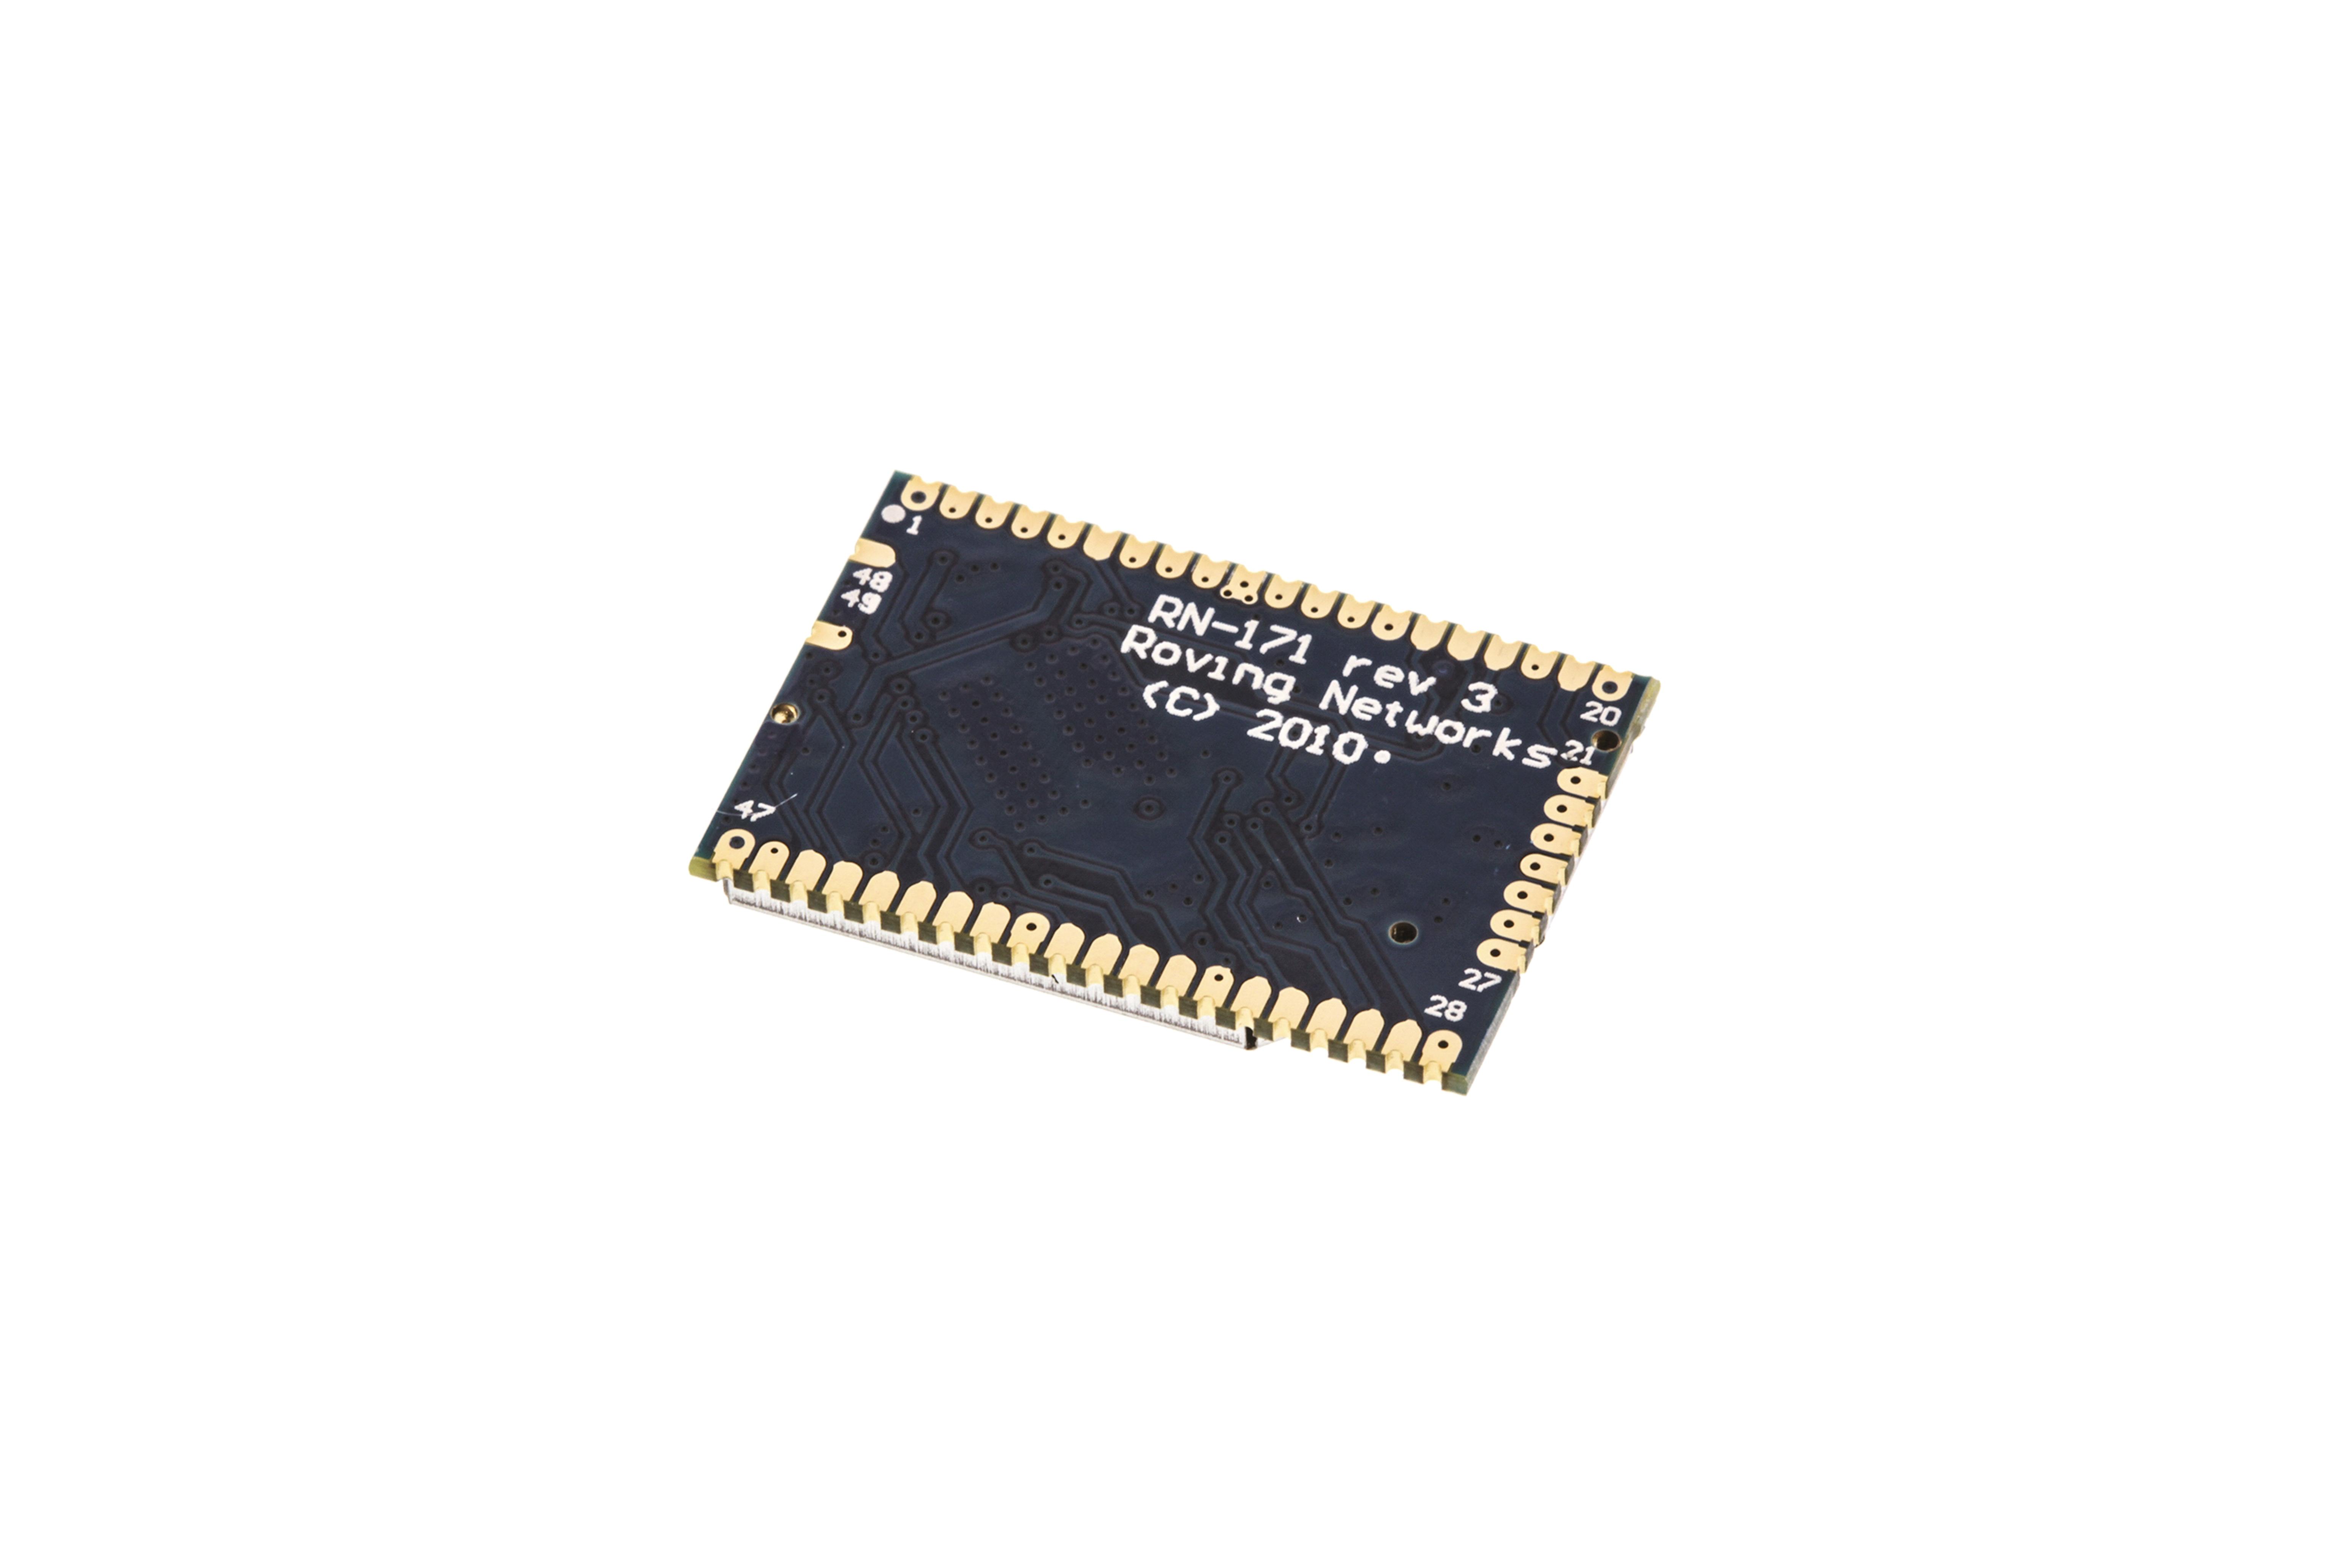 WiFi 802.11 b/g SMD-Modul mit RF-Pad